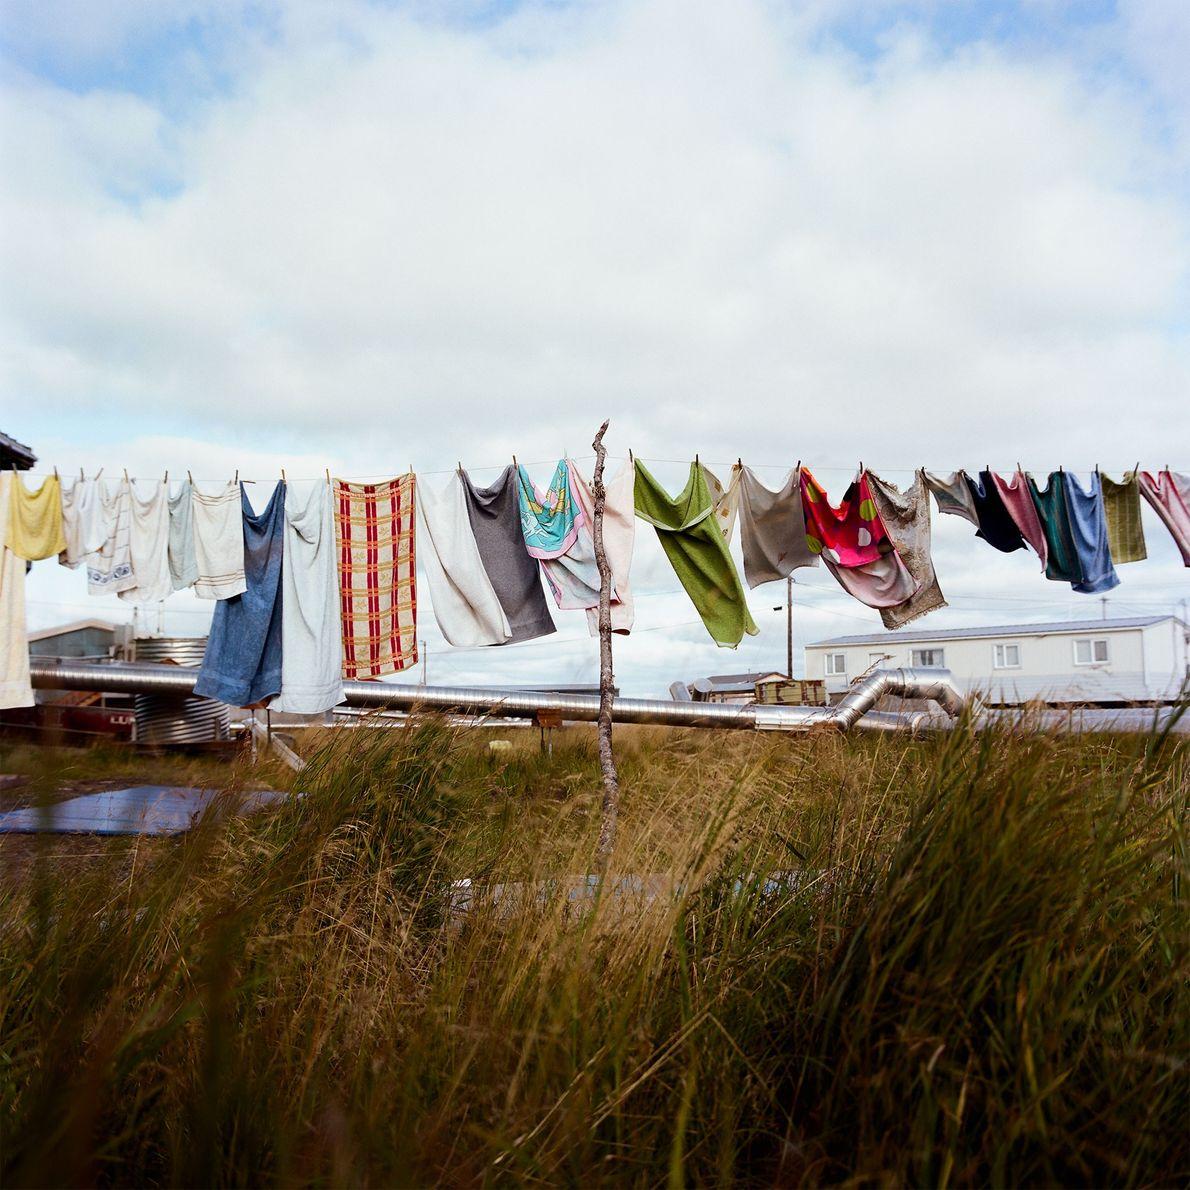 Clothes hang to dry in Quinhagak, Alaska.